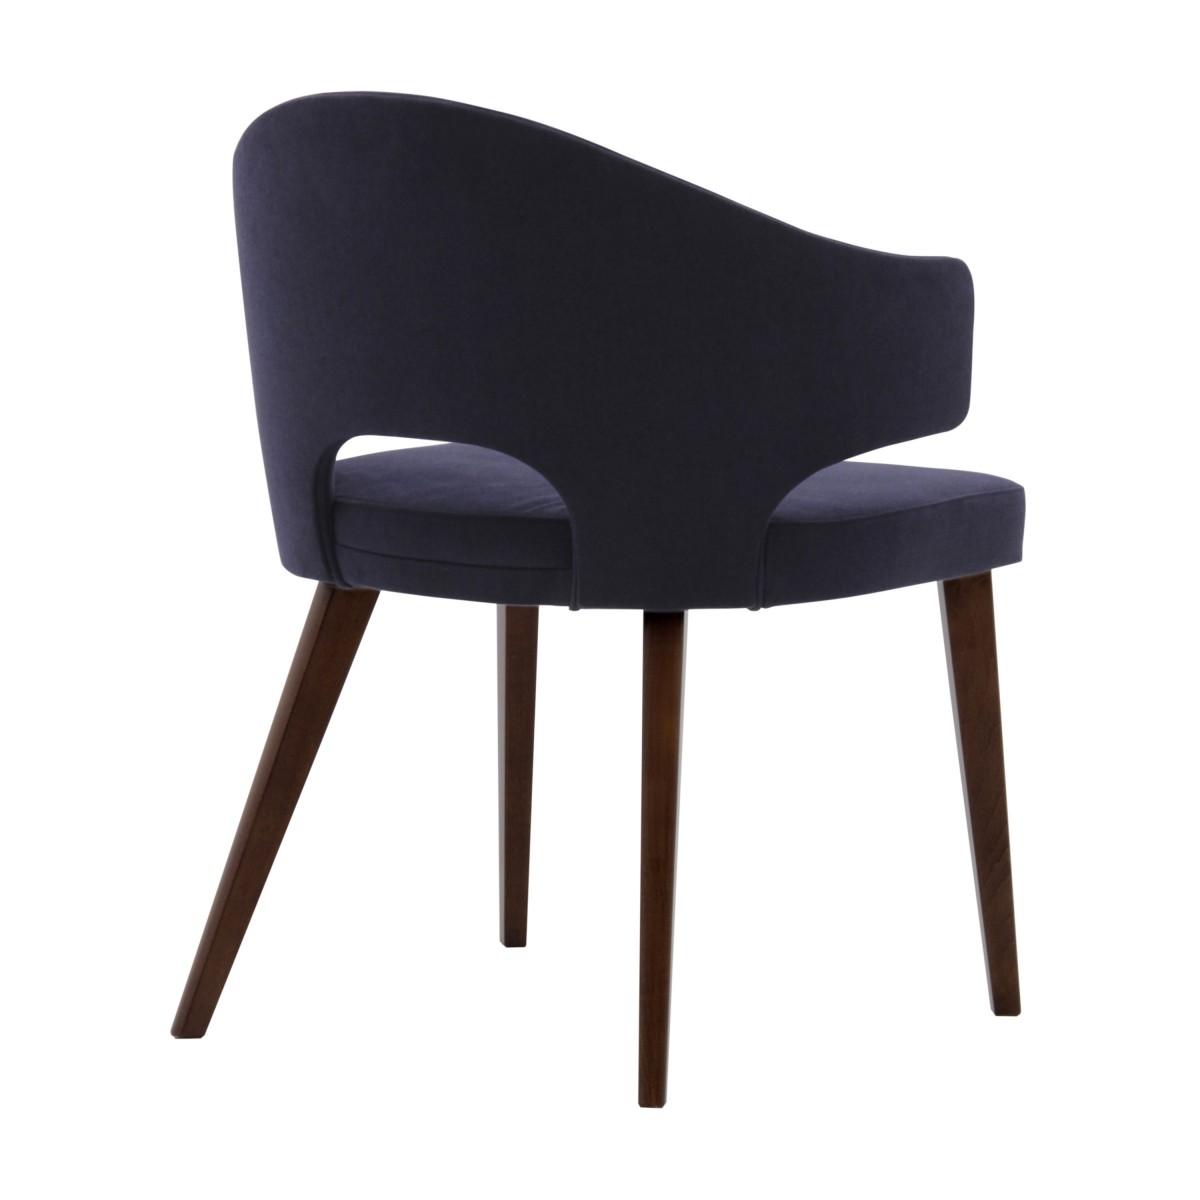 contemporary italian wood purple armchair eva1 9155